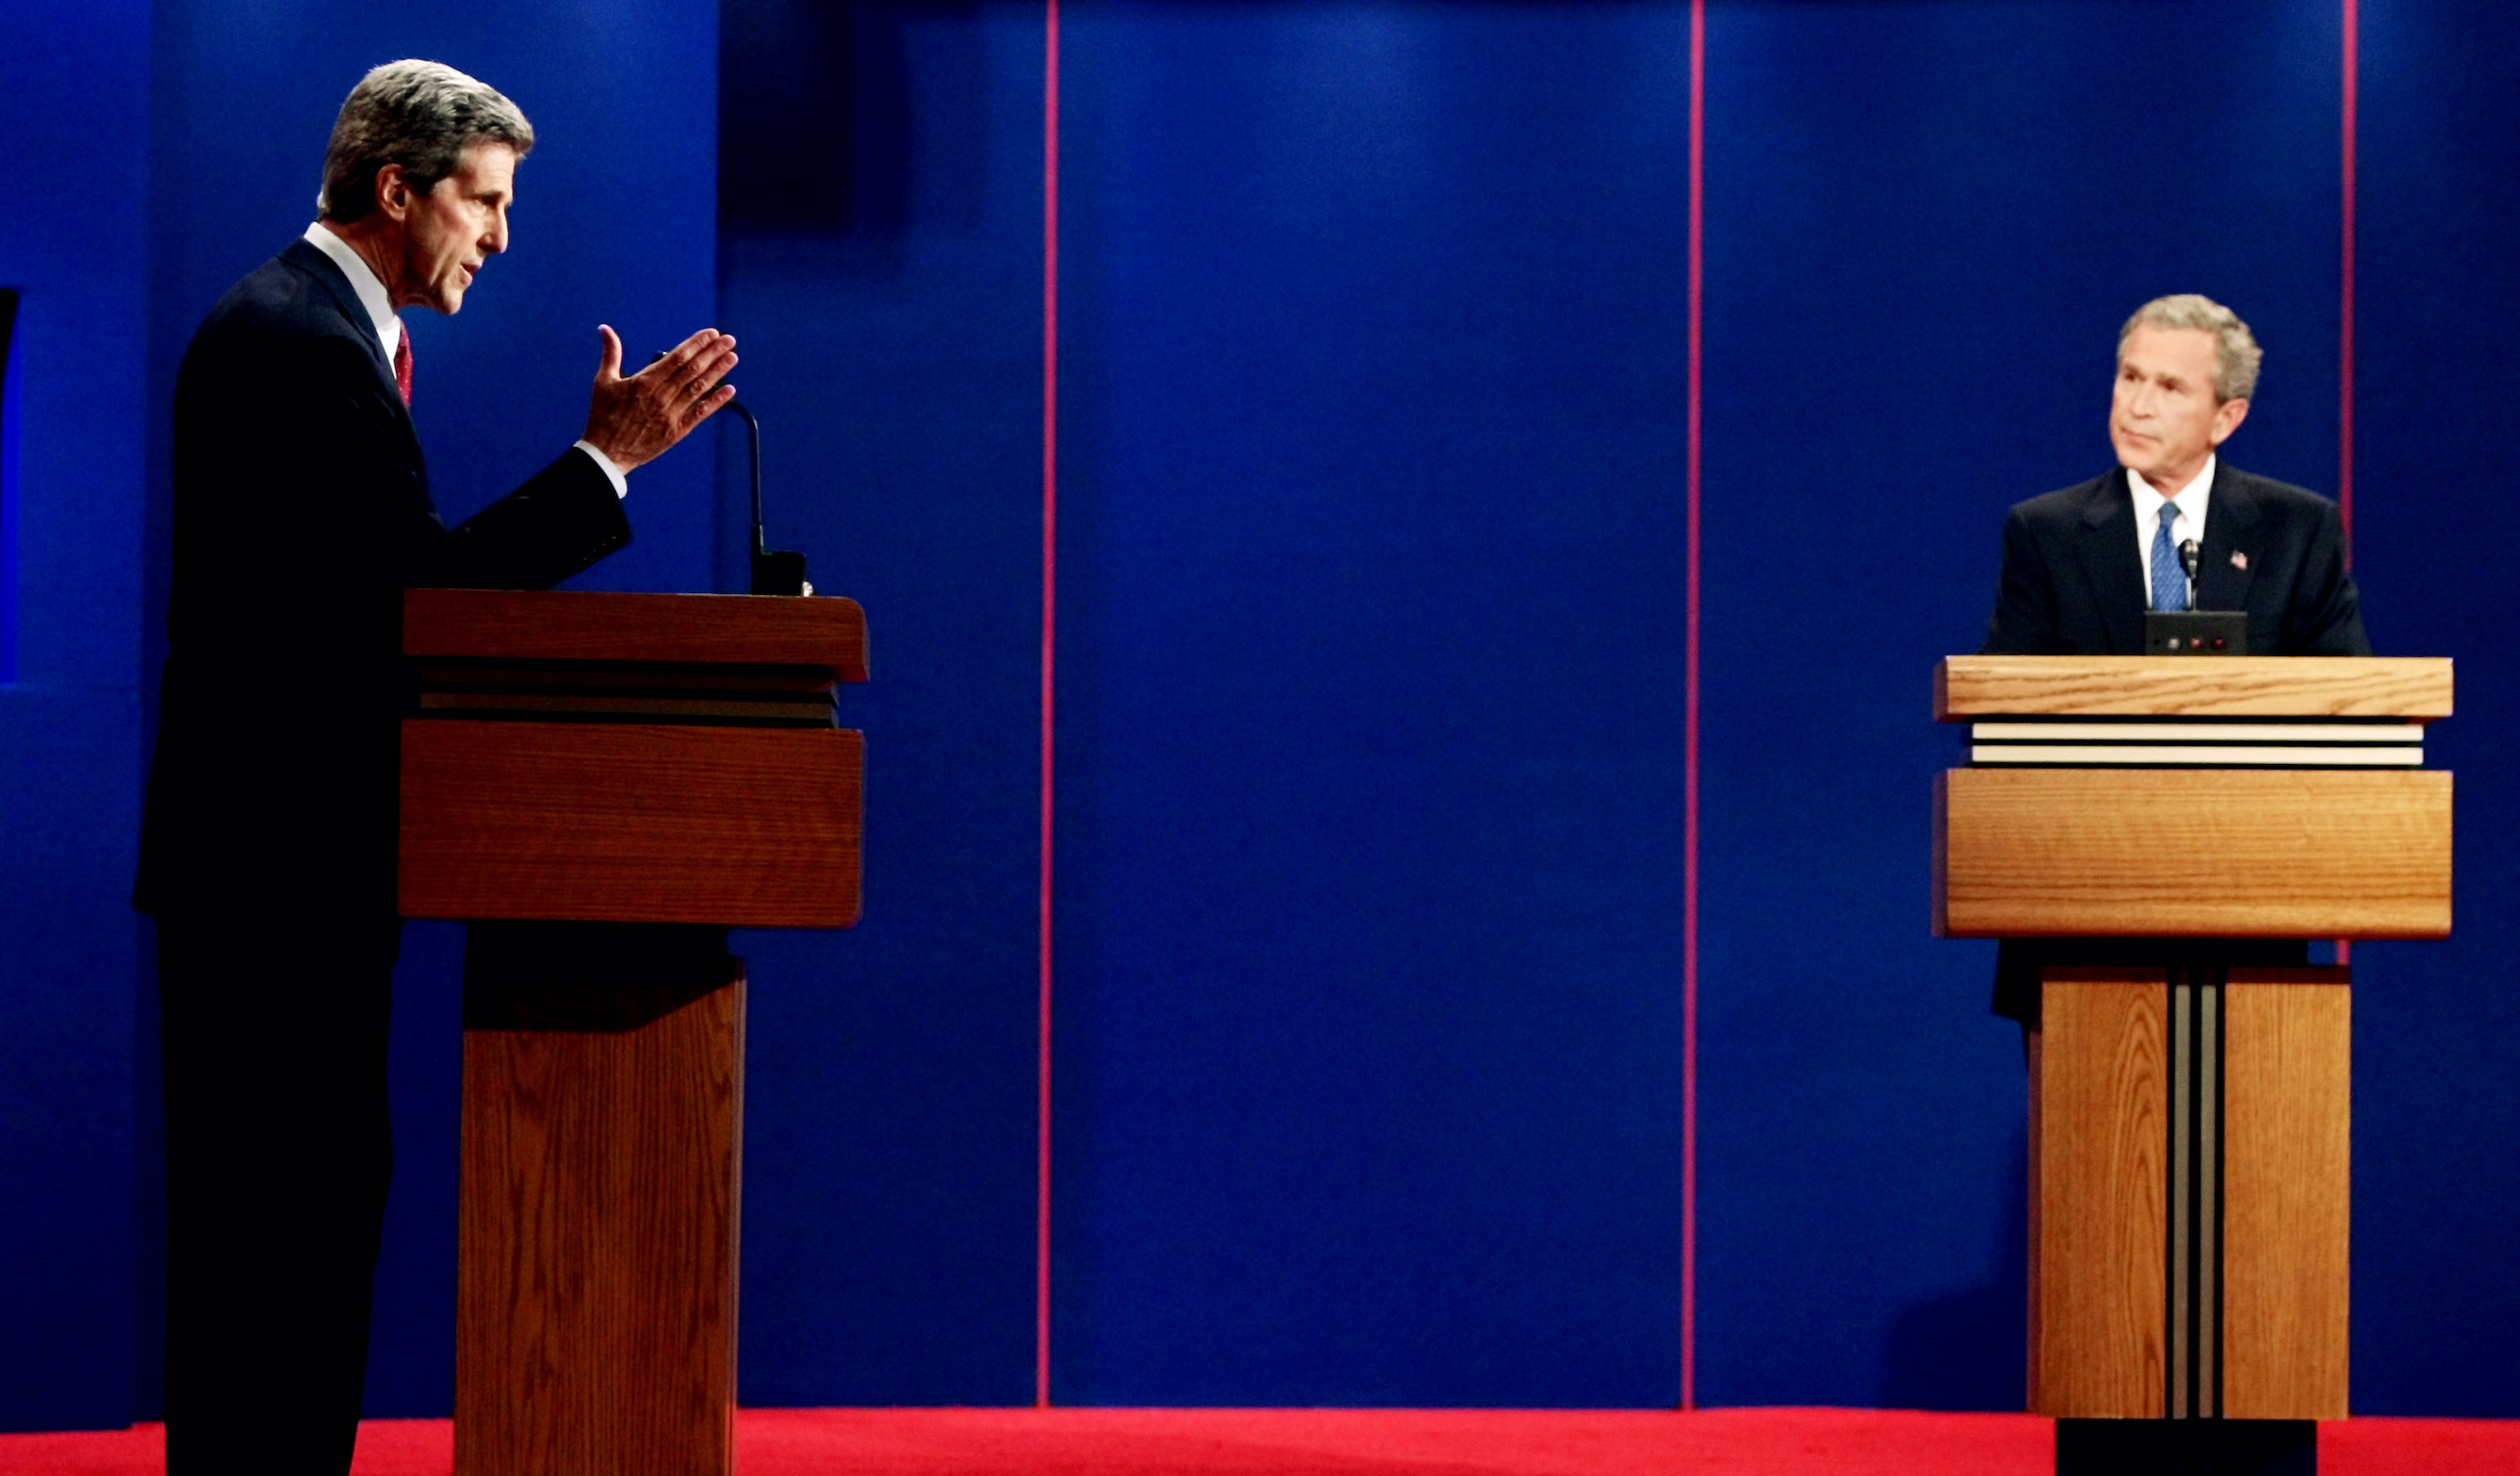 Bush vs. Kerry: The first 2004 presidential debate